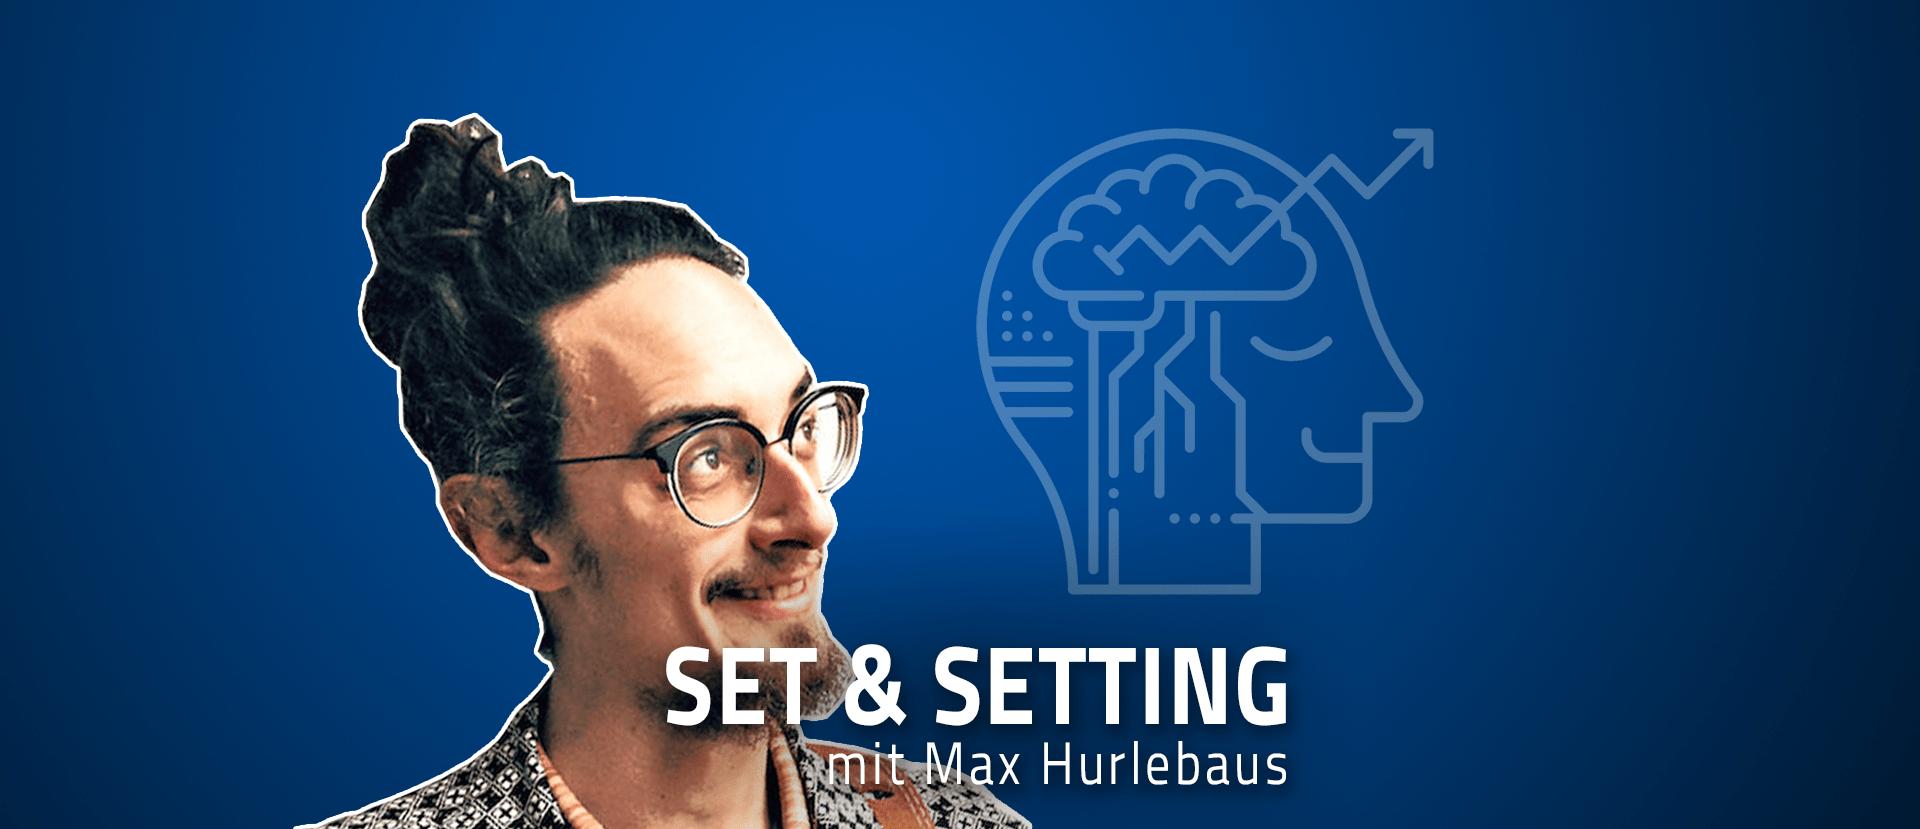 Max Hurlebaus Psychedelika Podcast Set Setting Jascha Renner